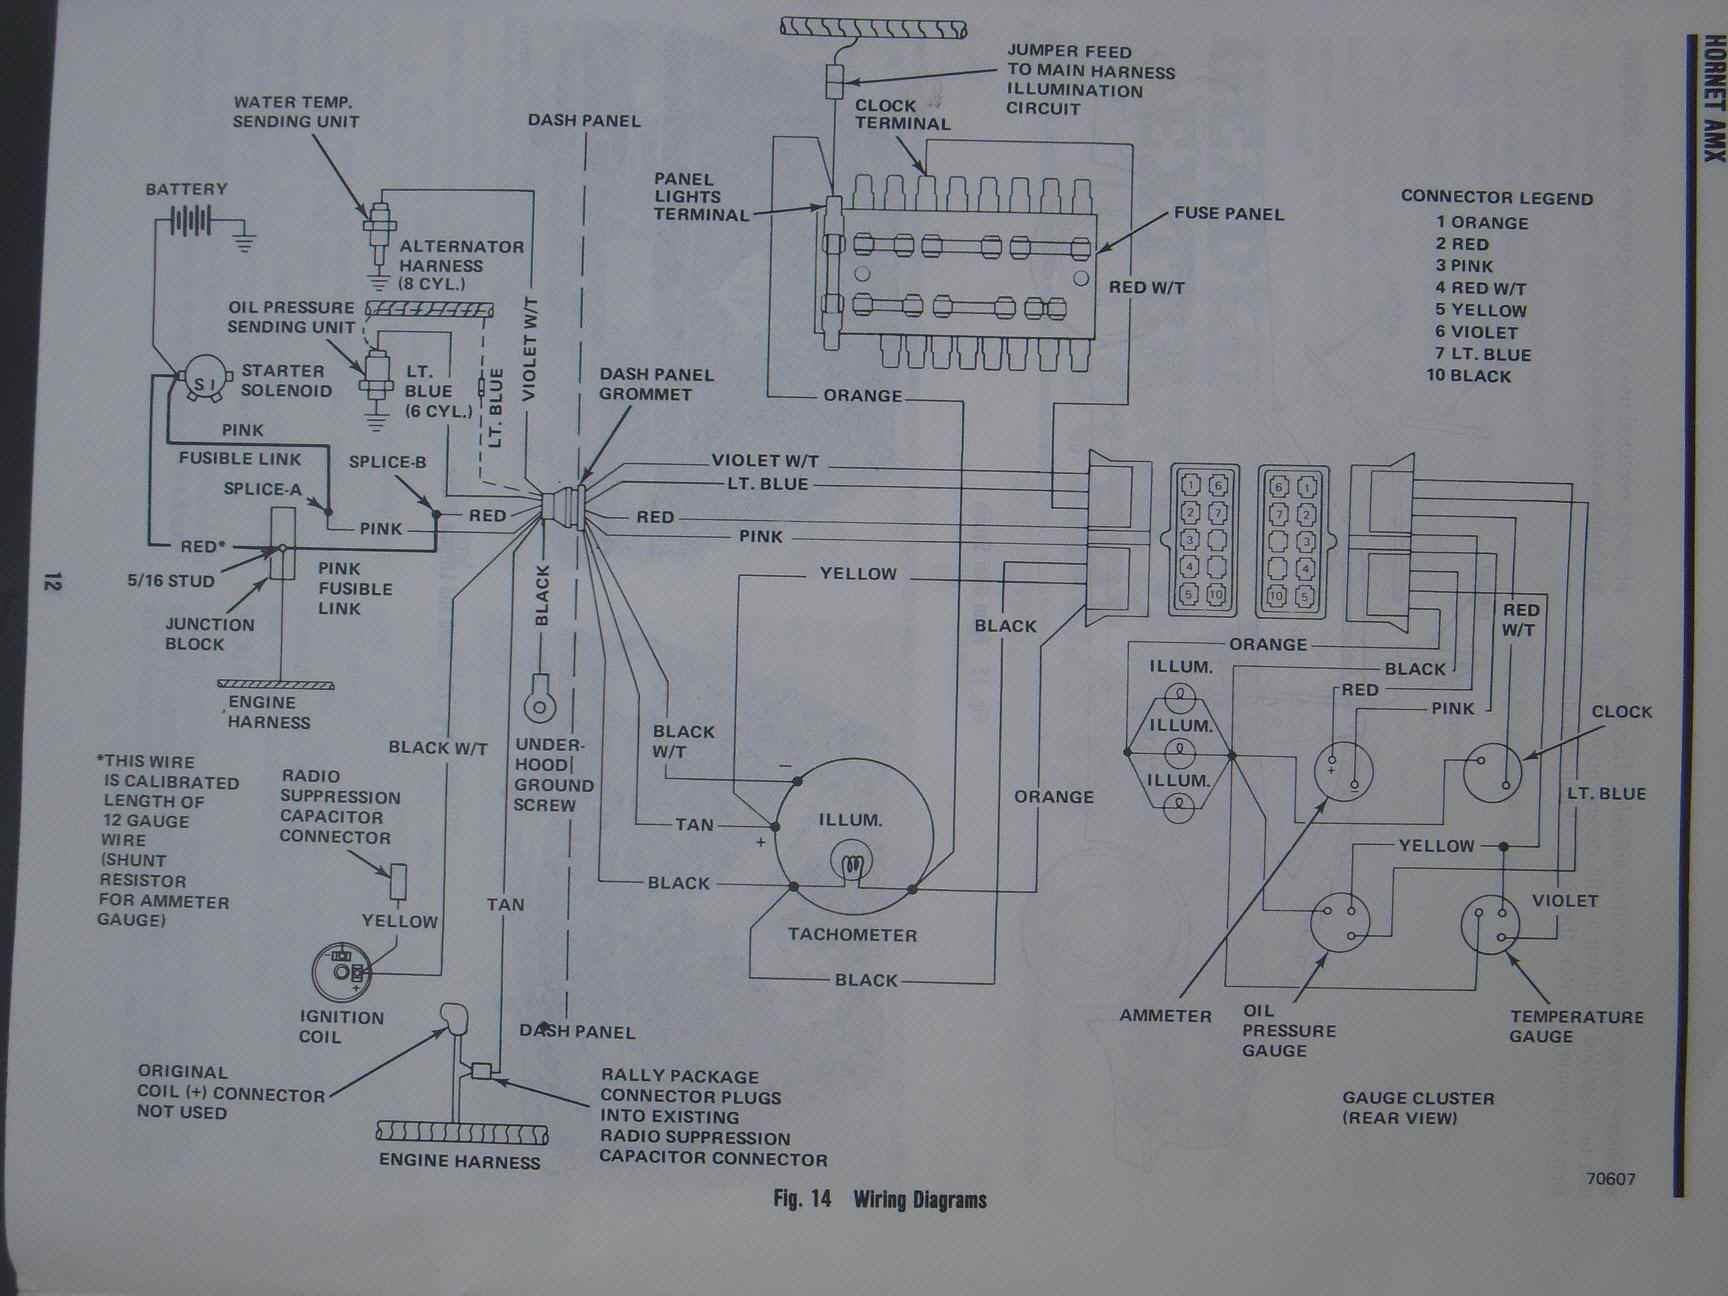 [SCHEMATICS_49CH]  VM_8643] 1973 Amc Hornet Wiring Diagrams Free Diagram   Switch Gm Diagram Wiring 12498581      Sospe Itis Abole Oper Lacu Inifo Chim Isra Mohammedshrine Librar Wiring 101